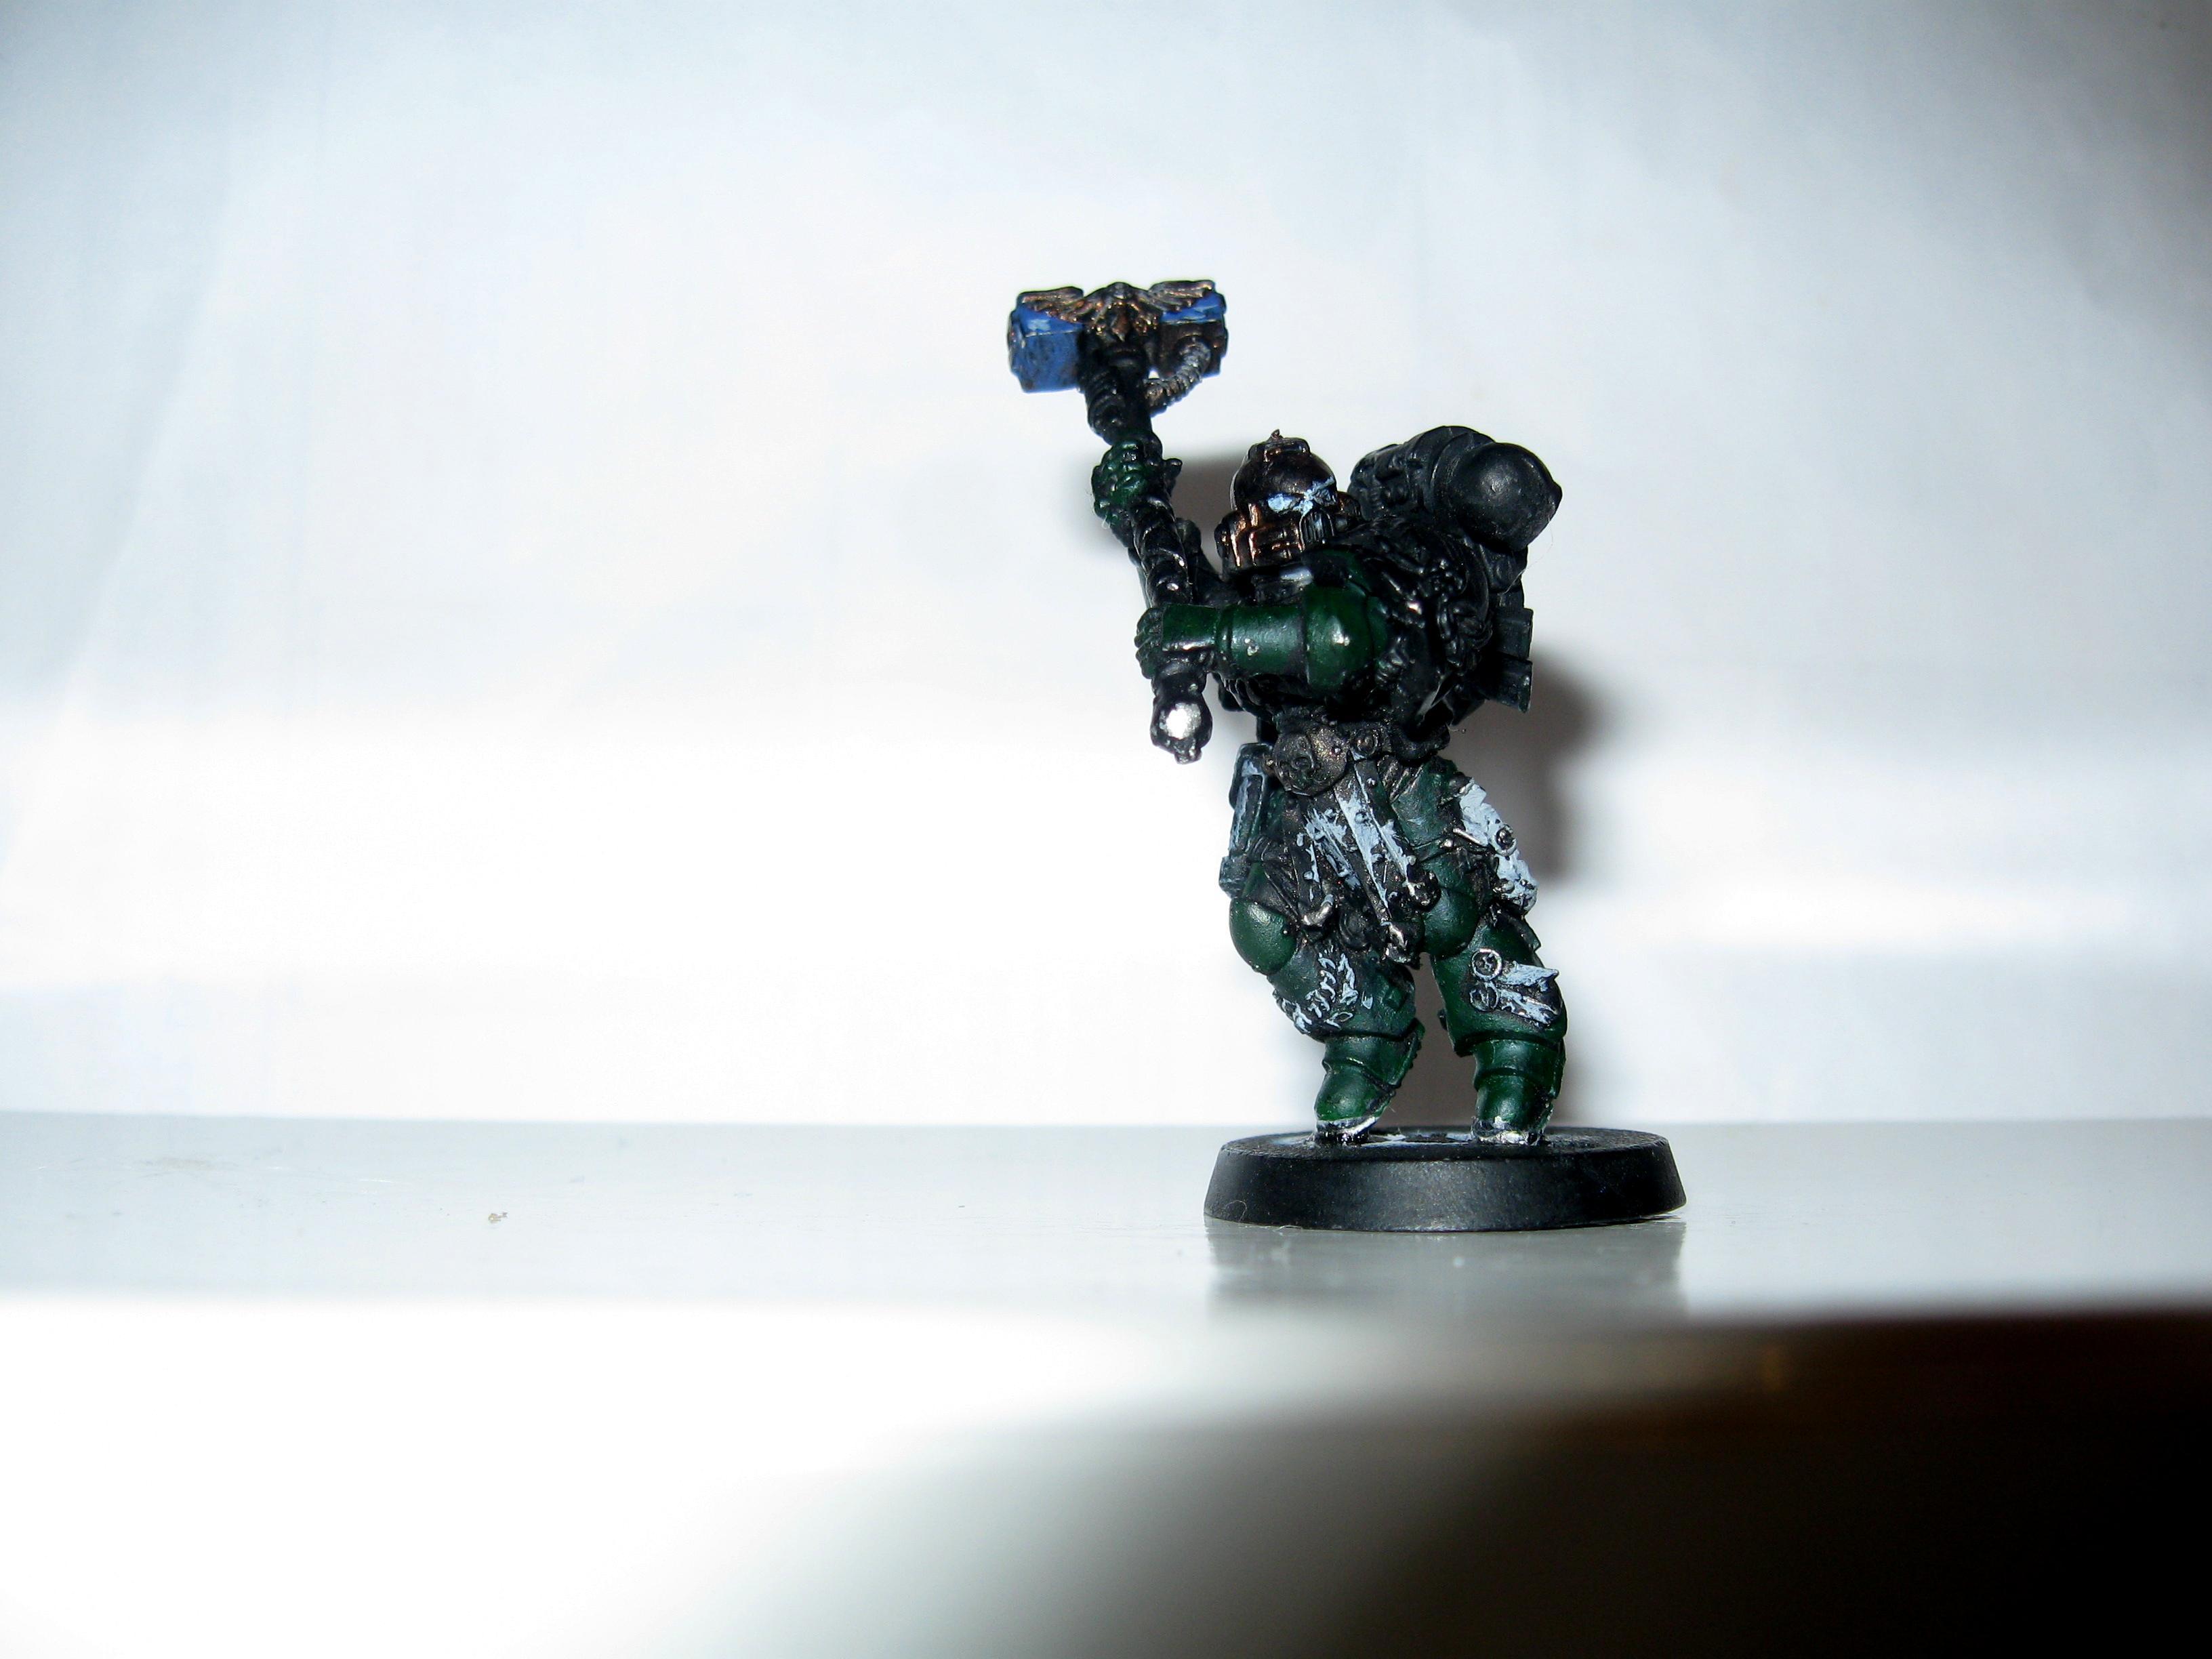 Prometheus of the 3rd company